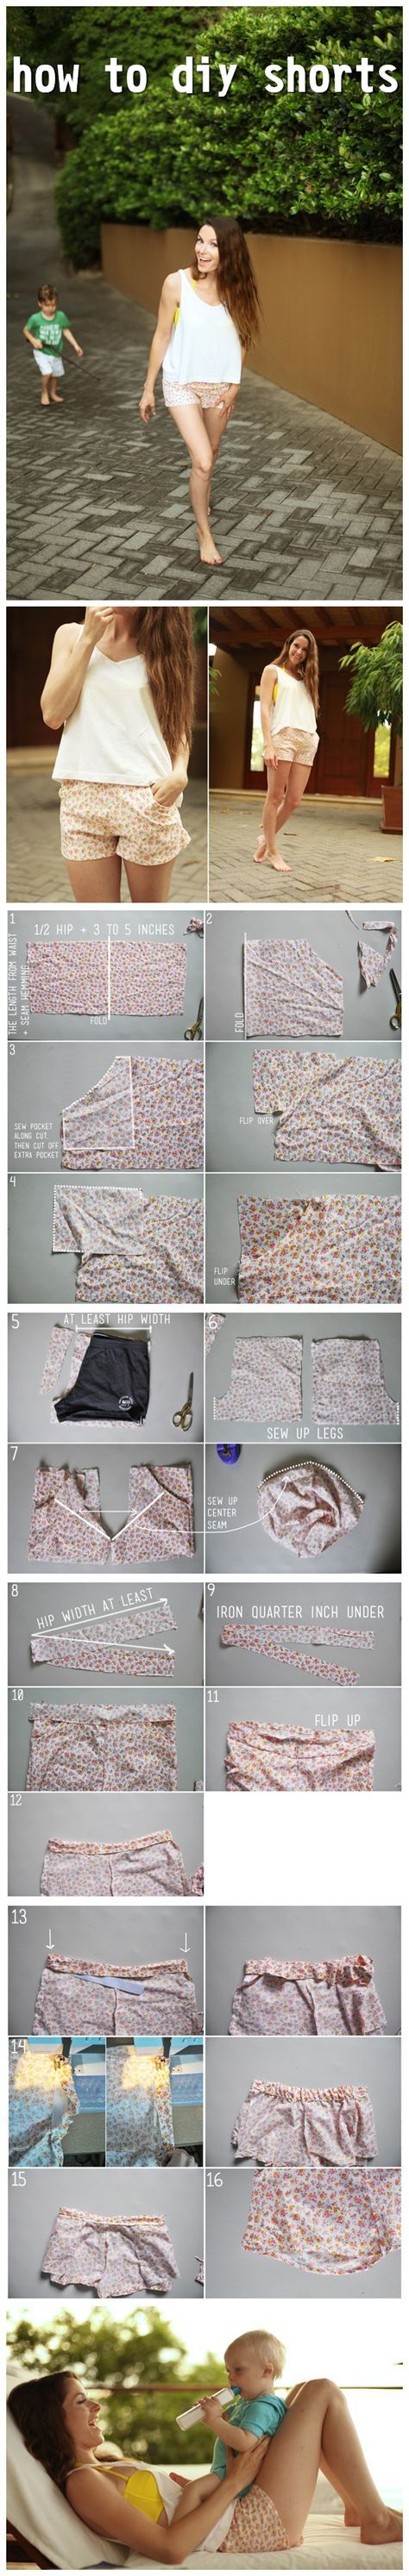 How to DIY shorts: http://www.hotdiytutorial.com/tag/shorts/